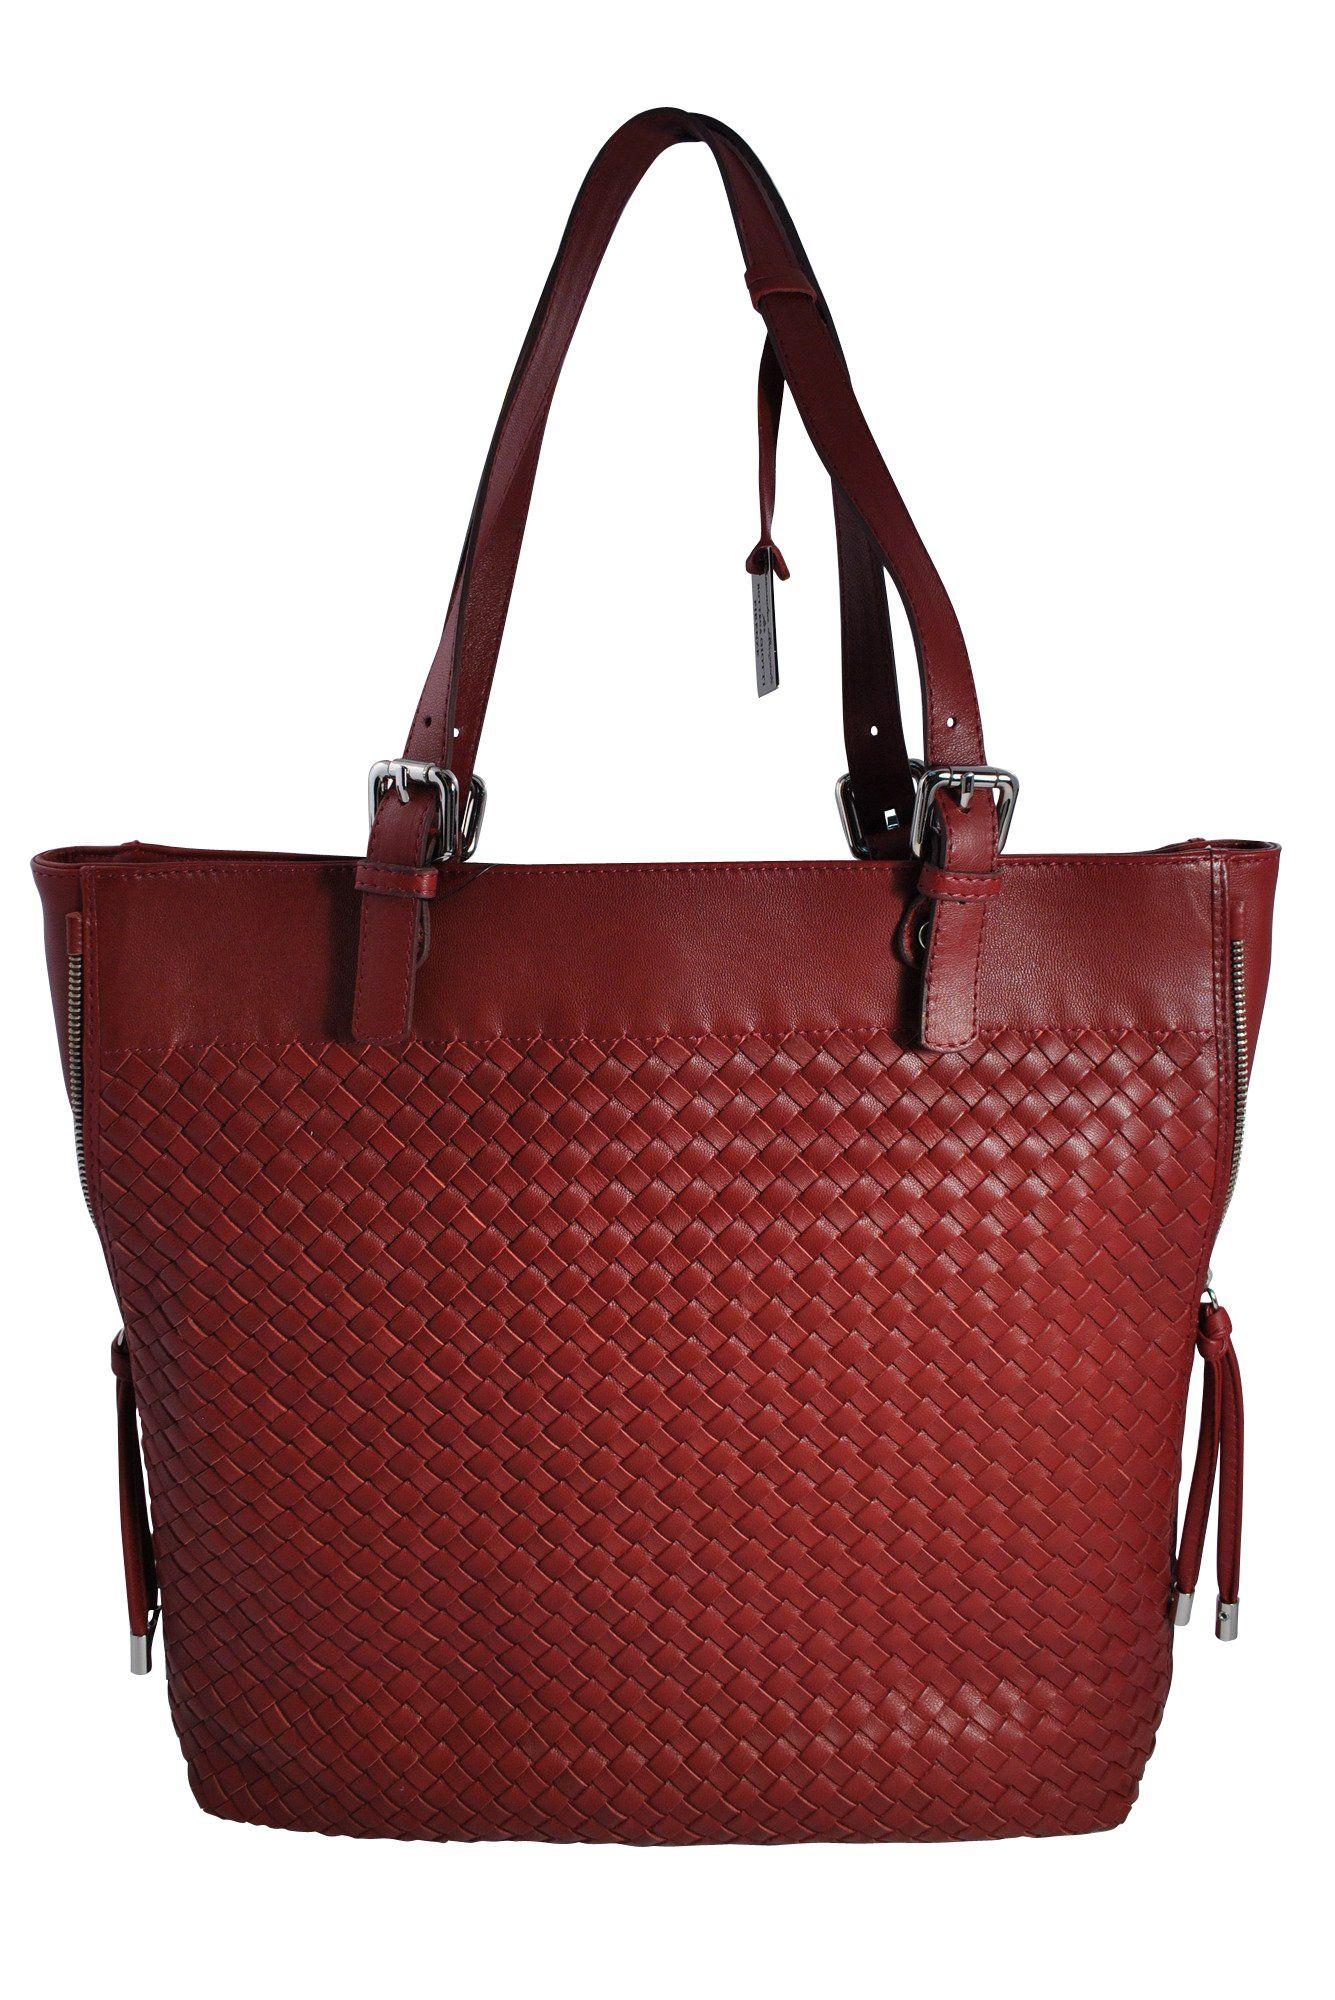 Bottega Giotti Red Burgundy Na Leather Woven Large Tote Handbag